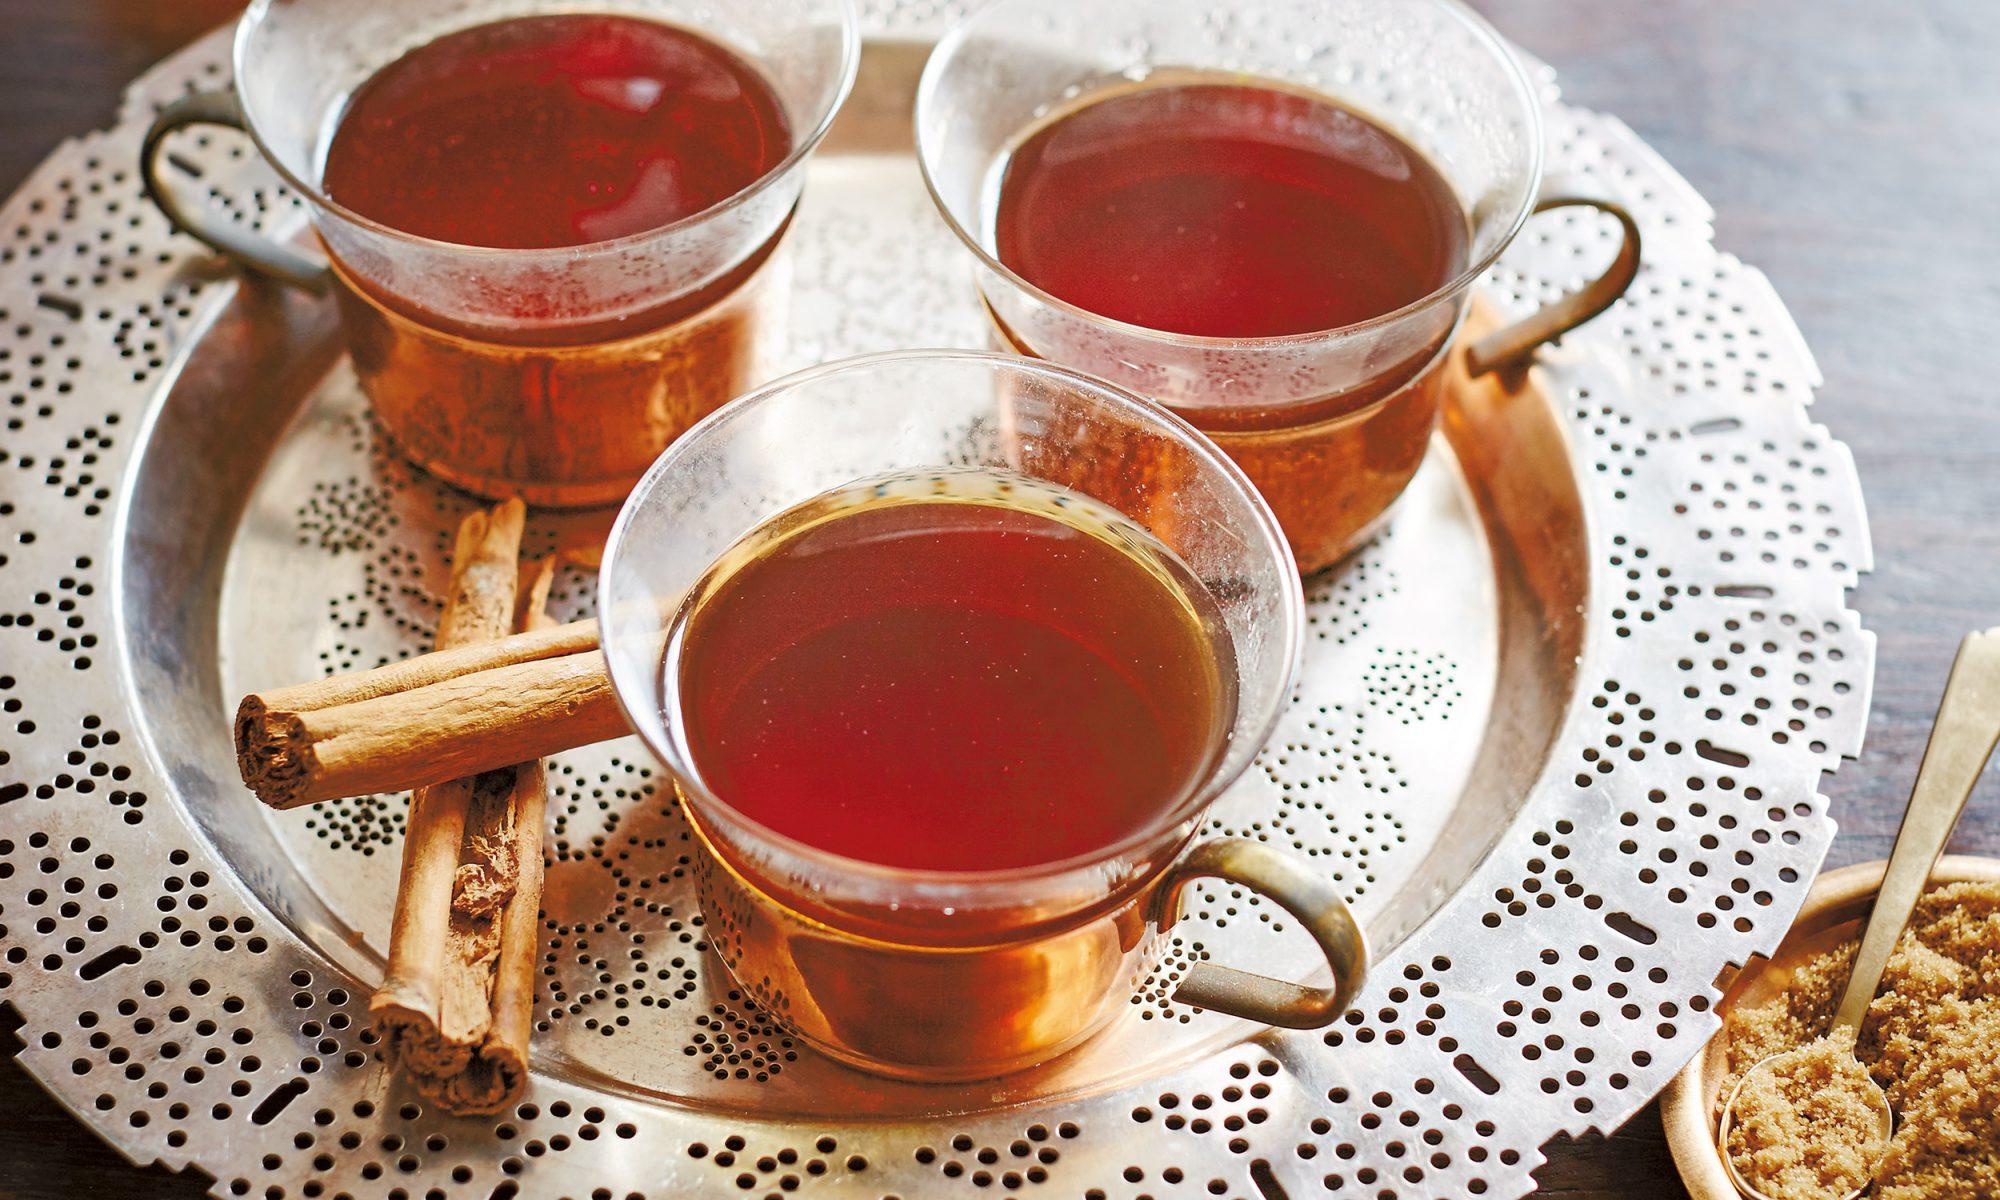 Roasted Dandelion Tea Is the New Coffee